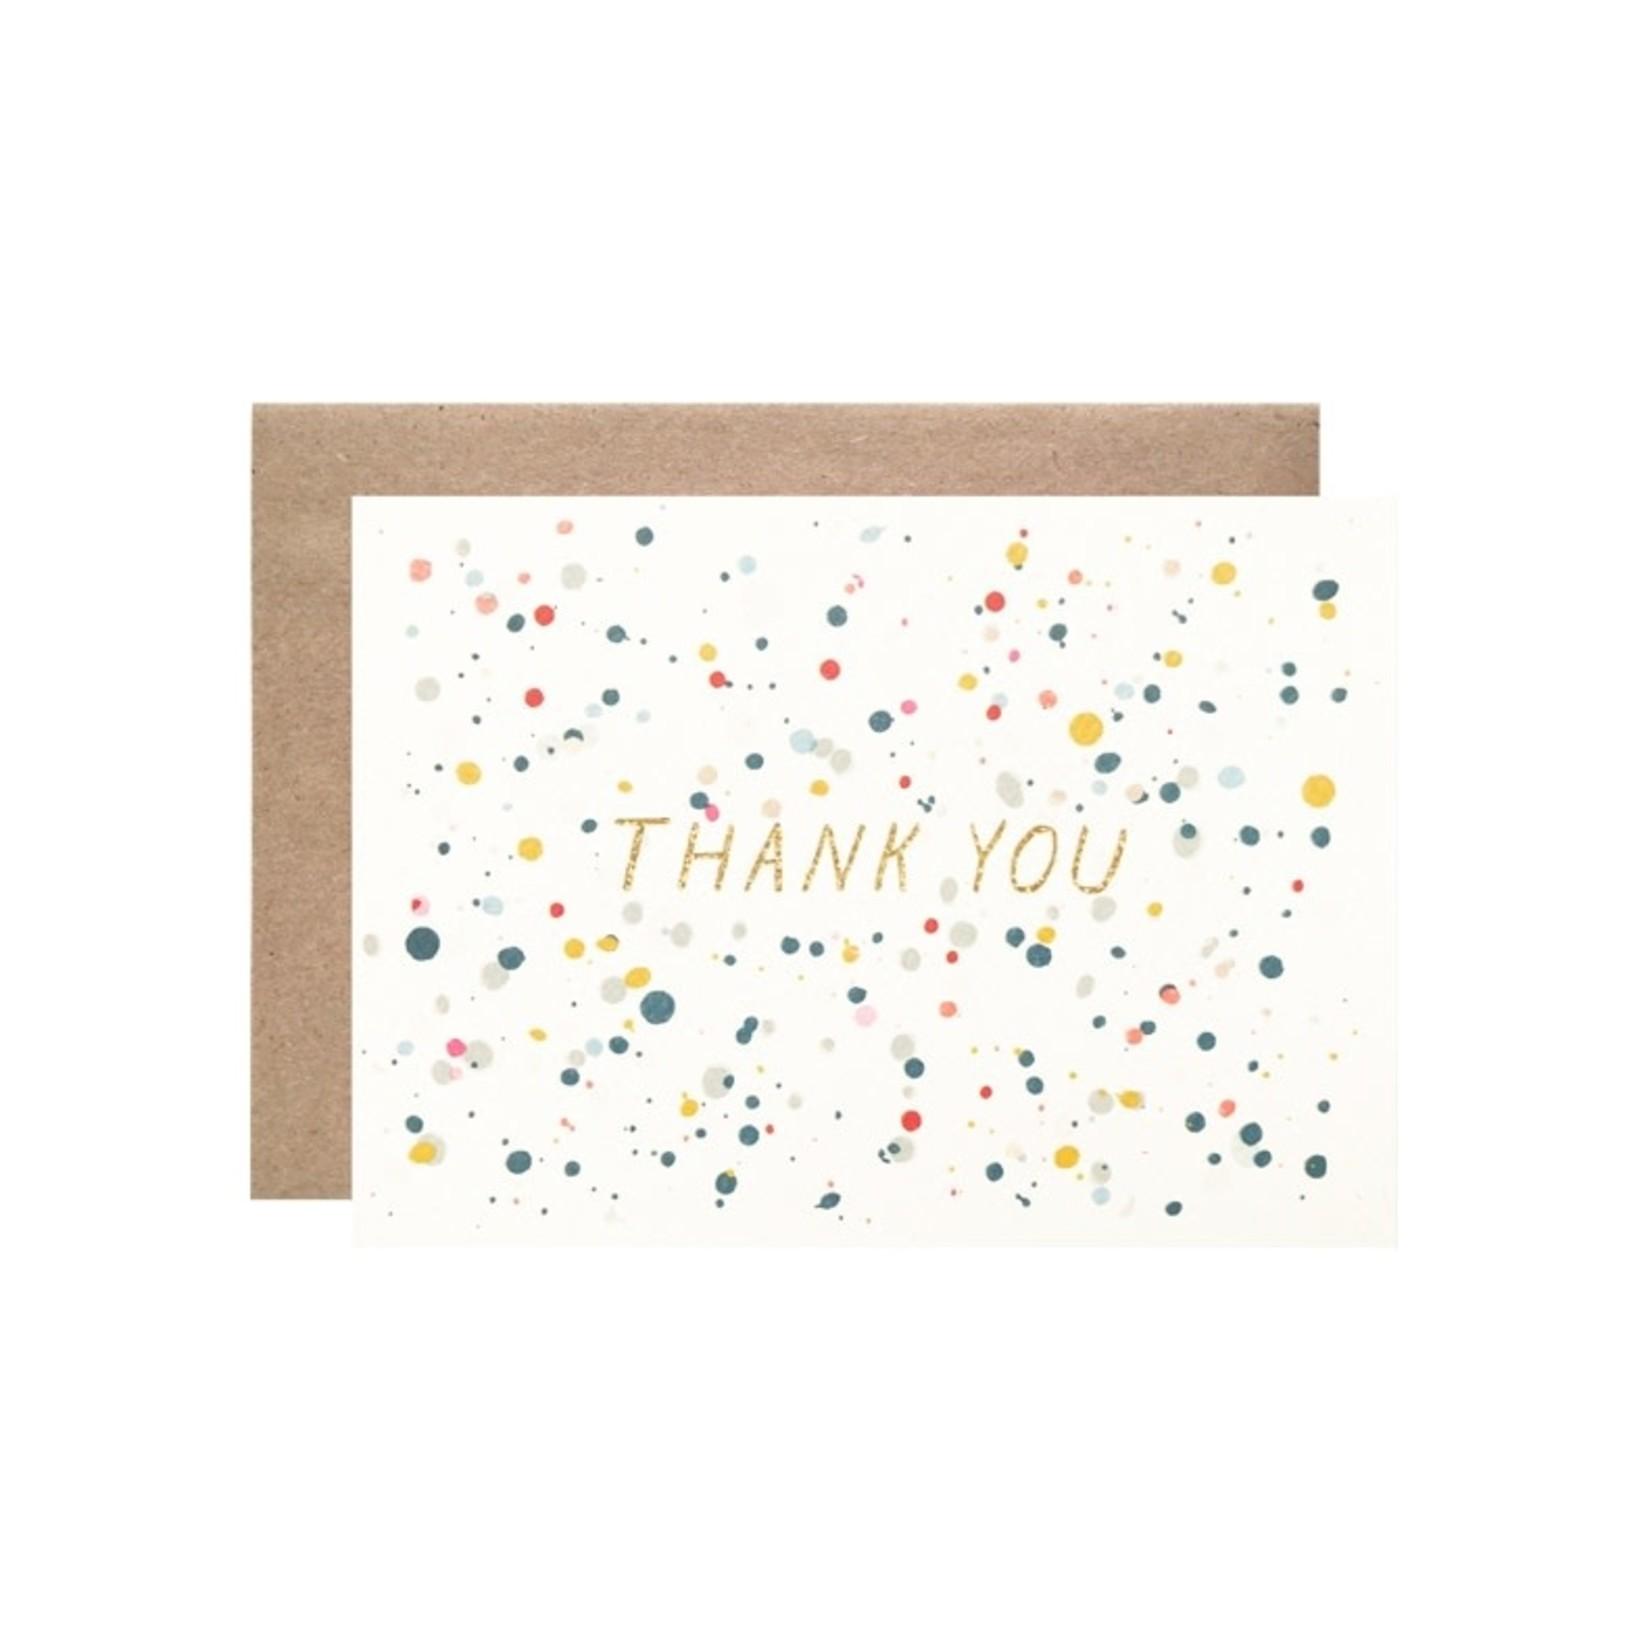 Hartland Brooklyn Hartland Brooklyn Box Set 8 - Thank You Splatter with Gold Glitter Foil